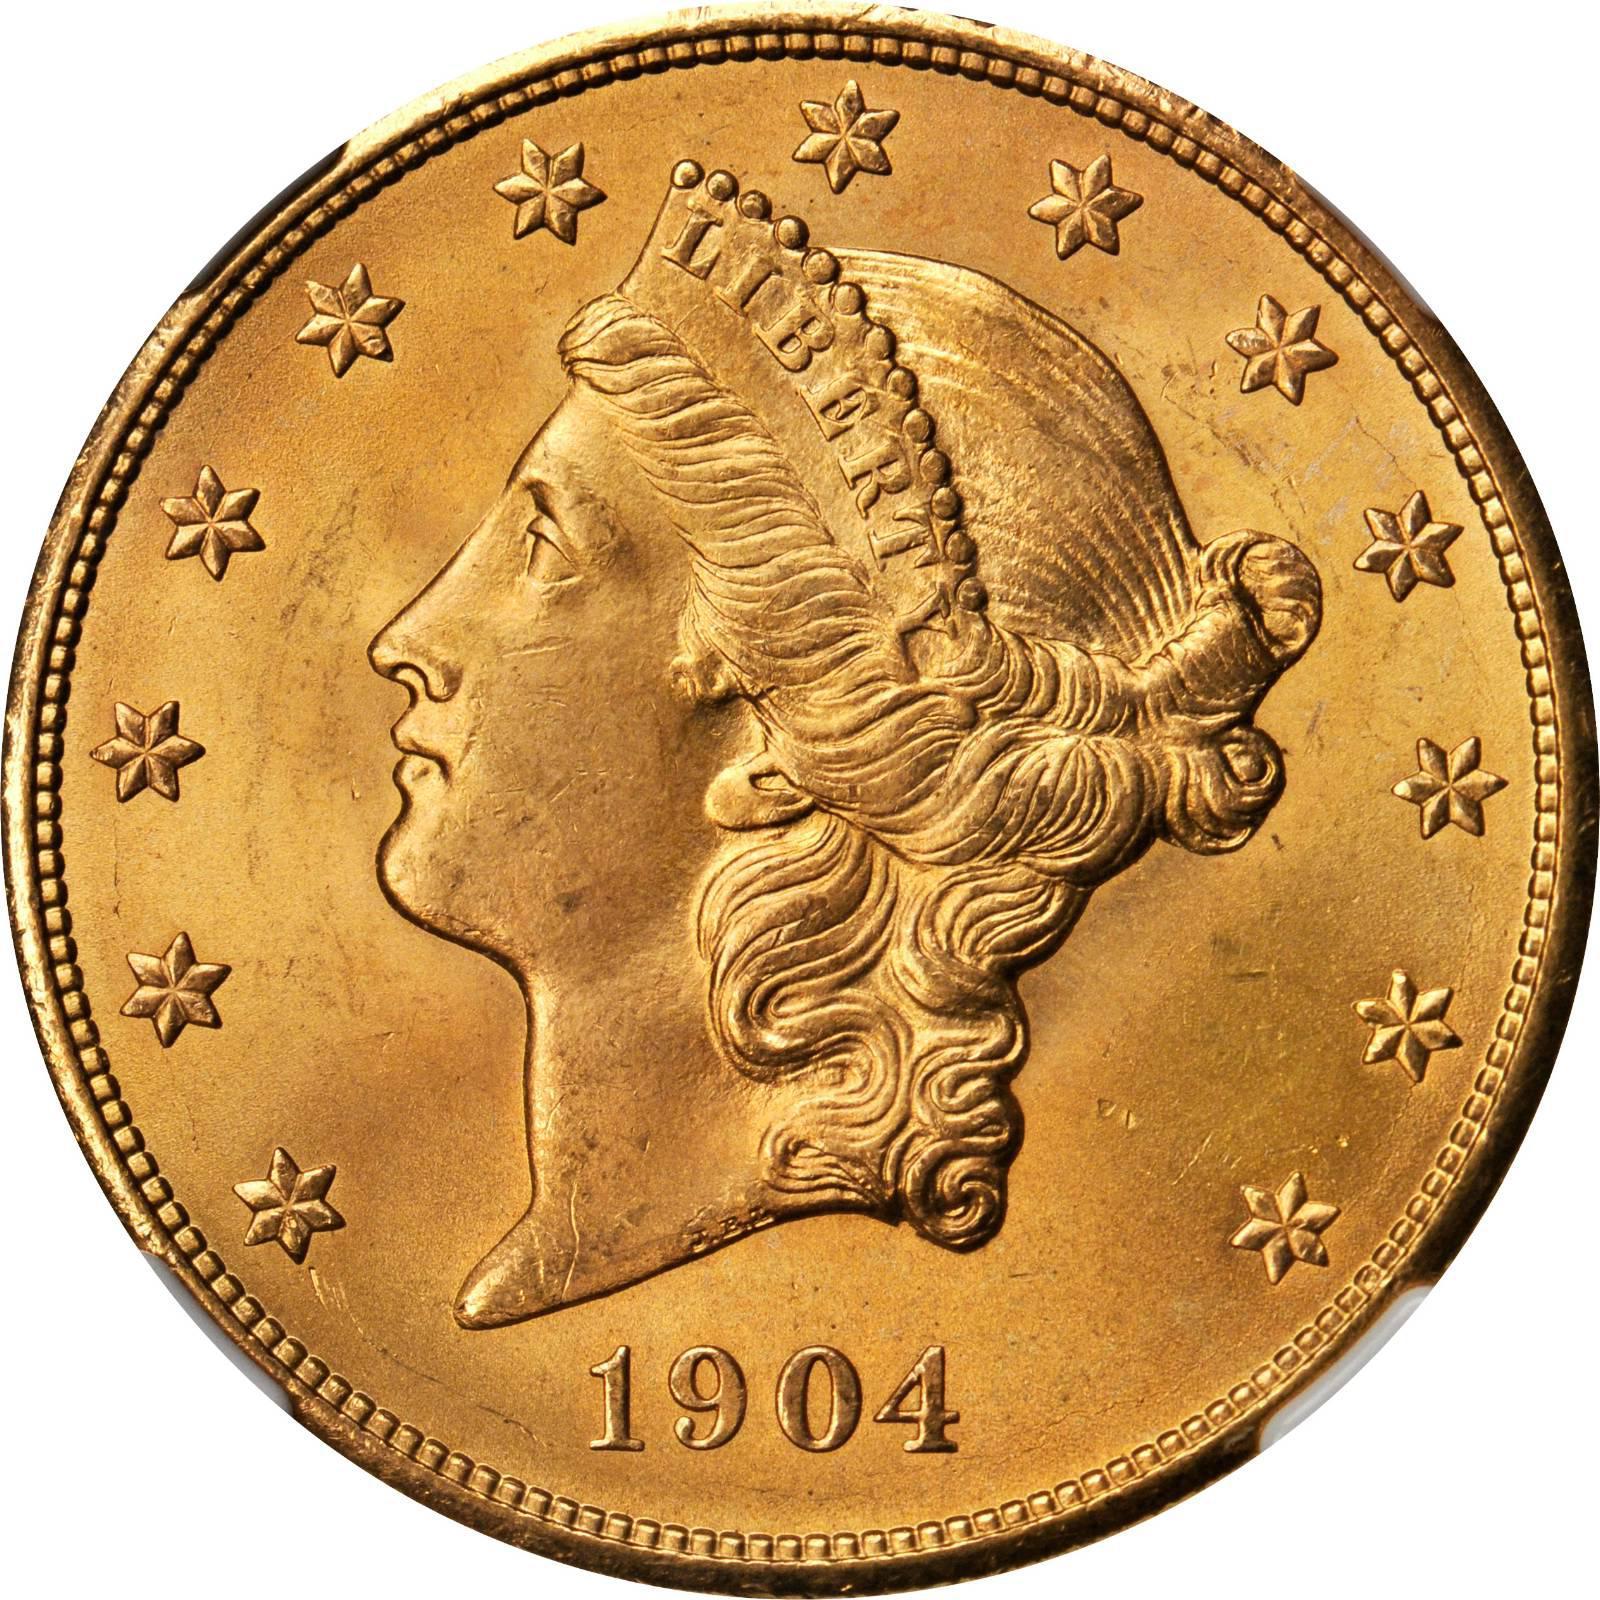 10 dollar gold coin value